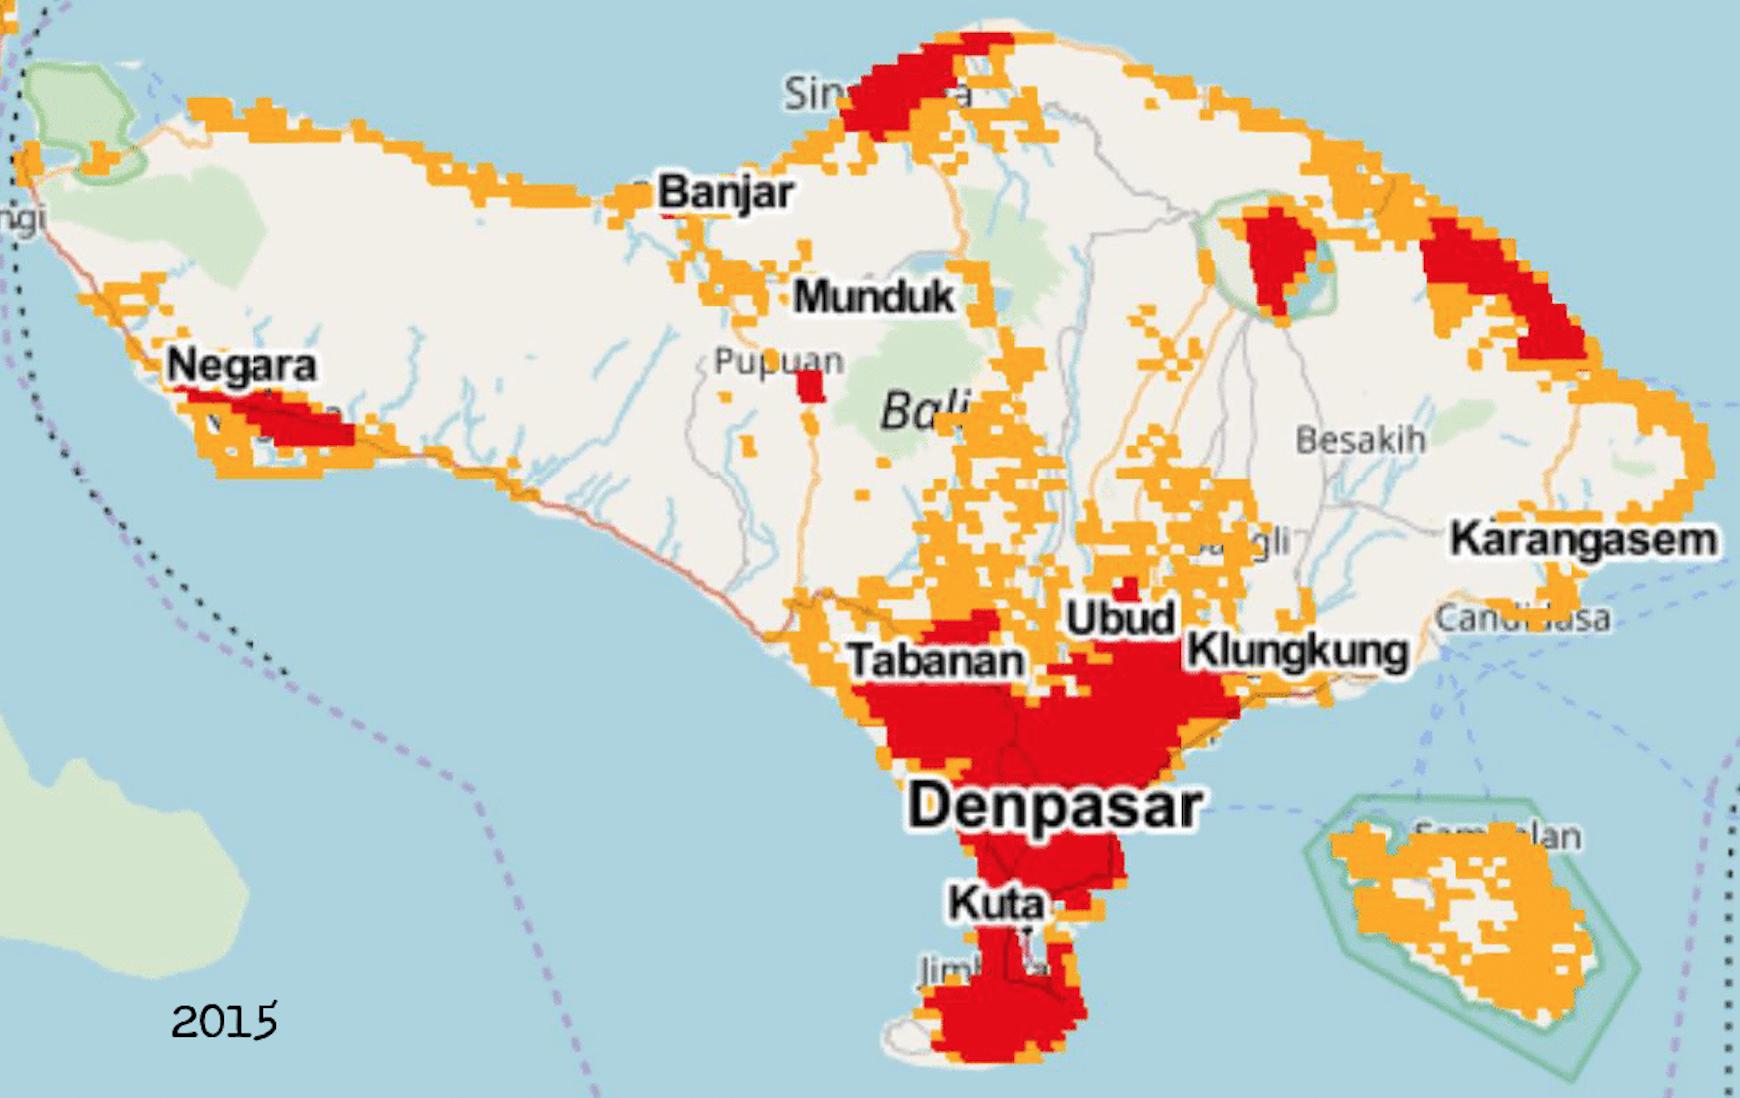 Tourism bali cartography 2000